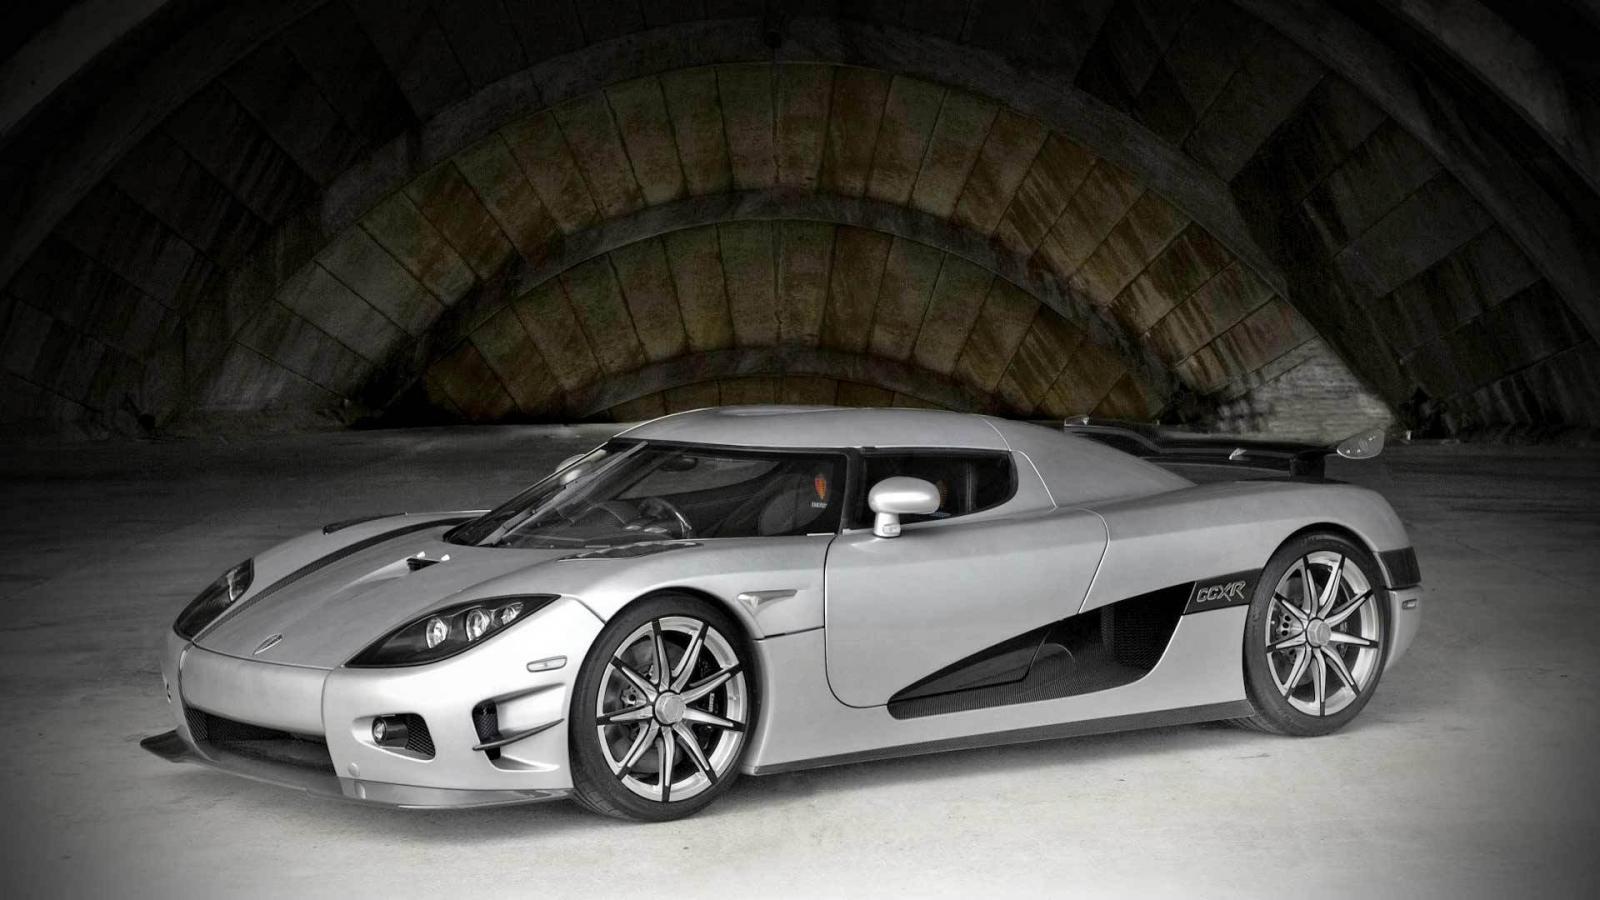 2009-Koenigsegg-CCXR-Trevita